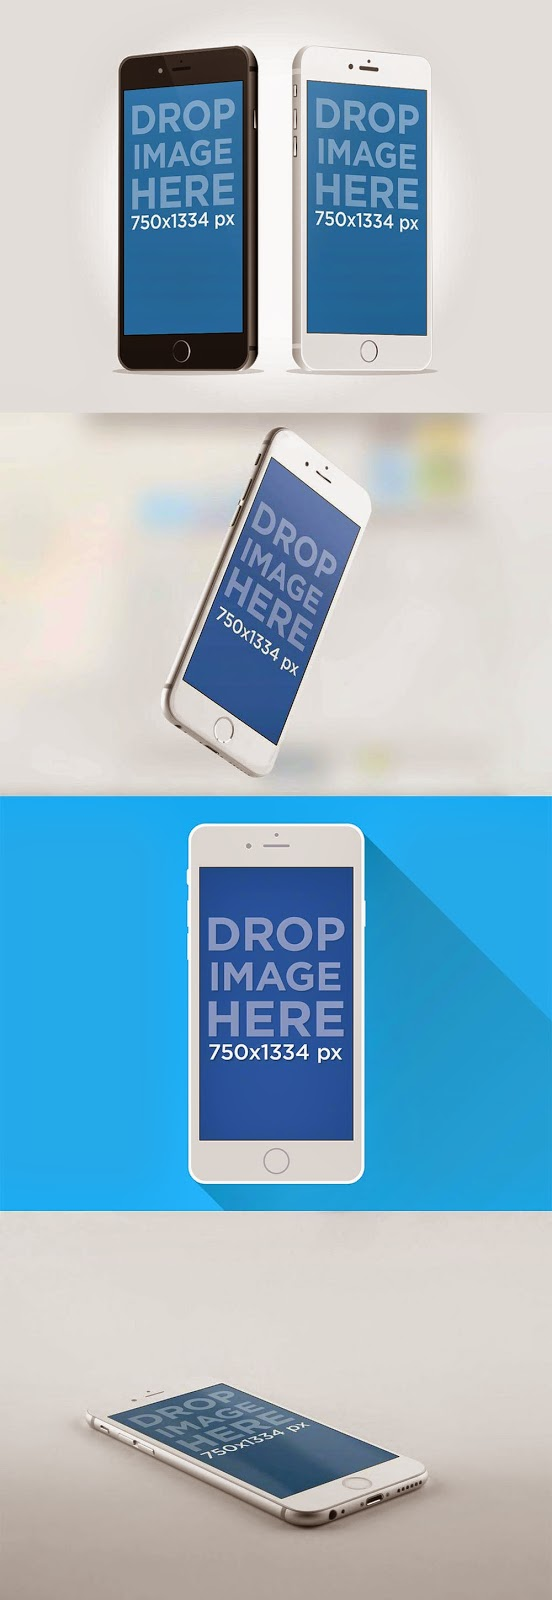 iPhone 6 Mockup Design Template